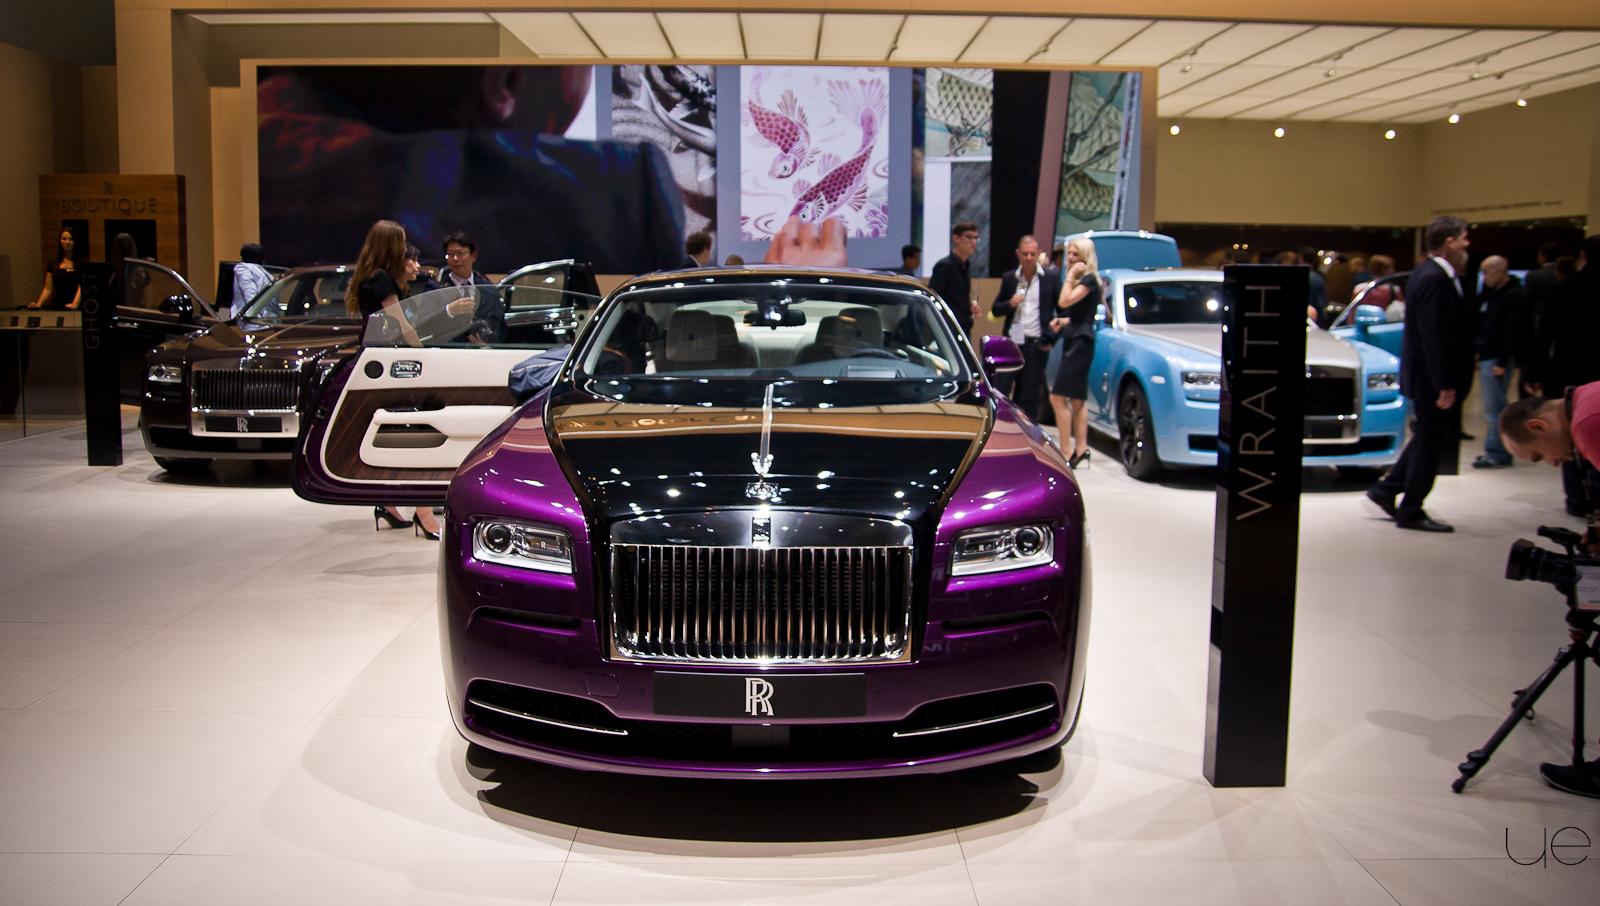 Salon de Francfort – Rolls Royce